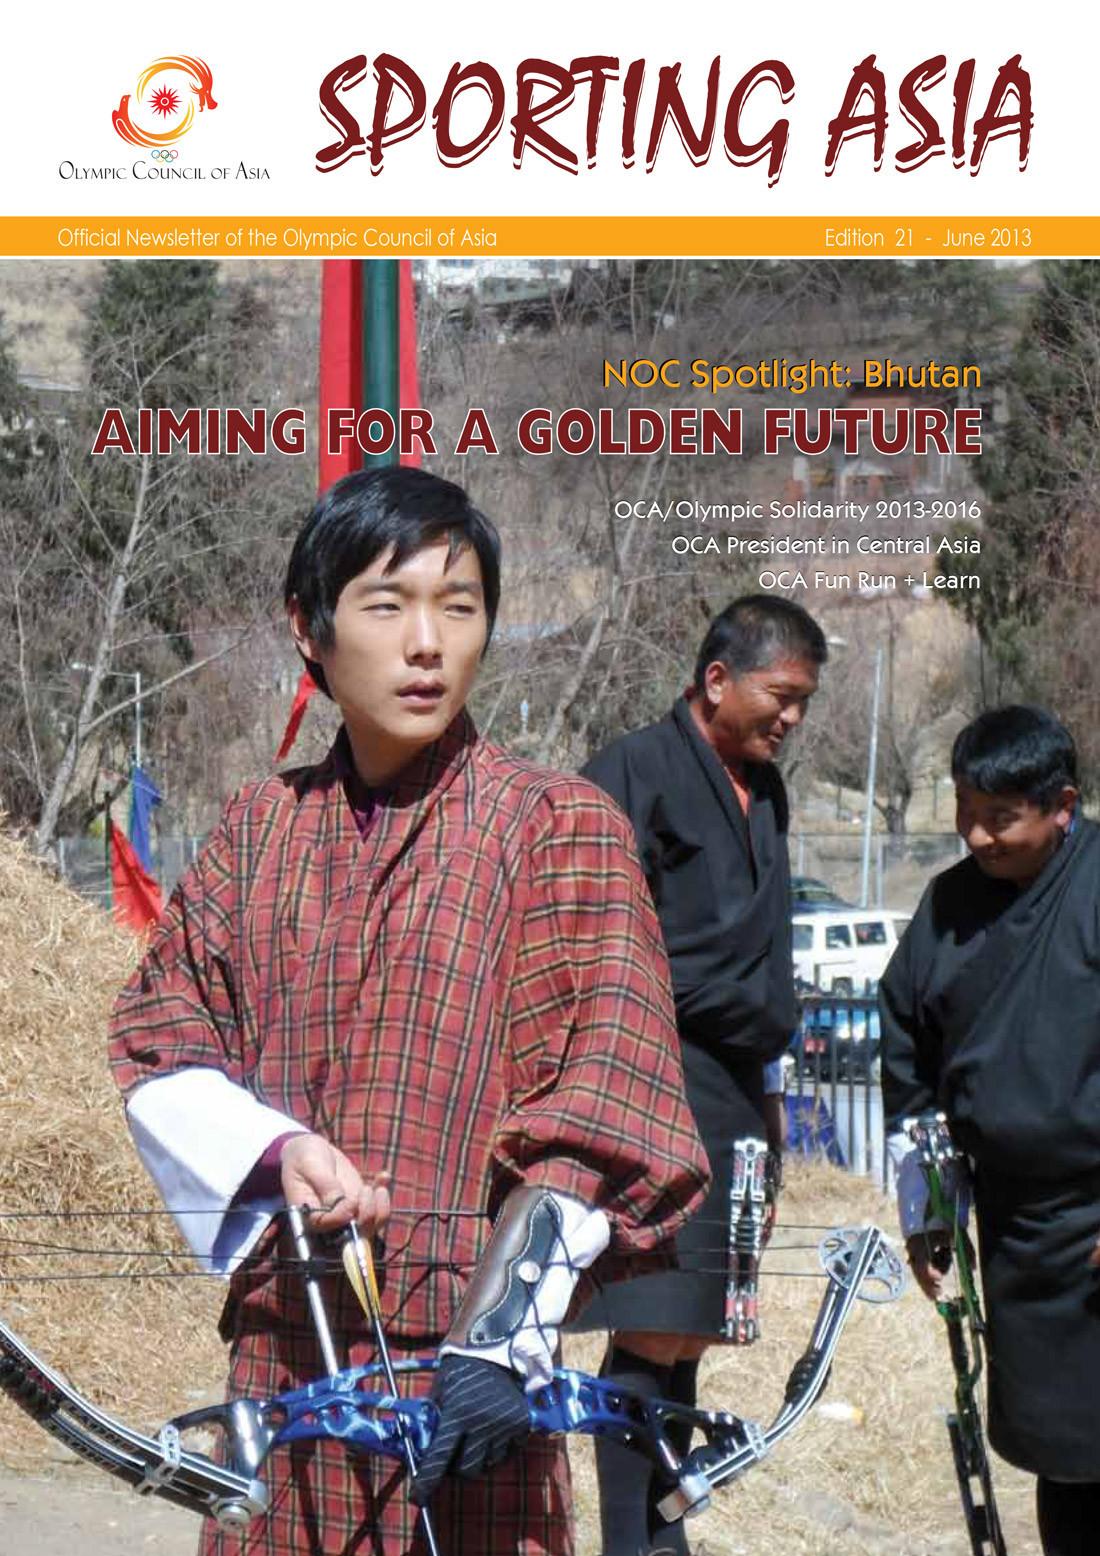 Sporting Asia - Edition 21 - JUN 2013